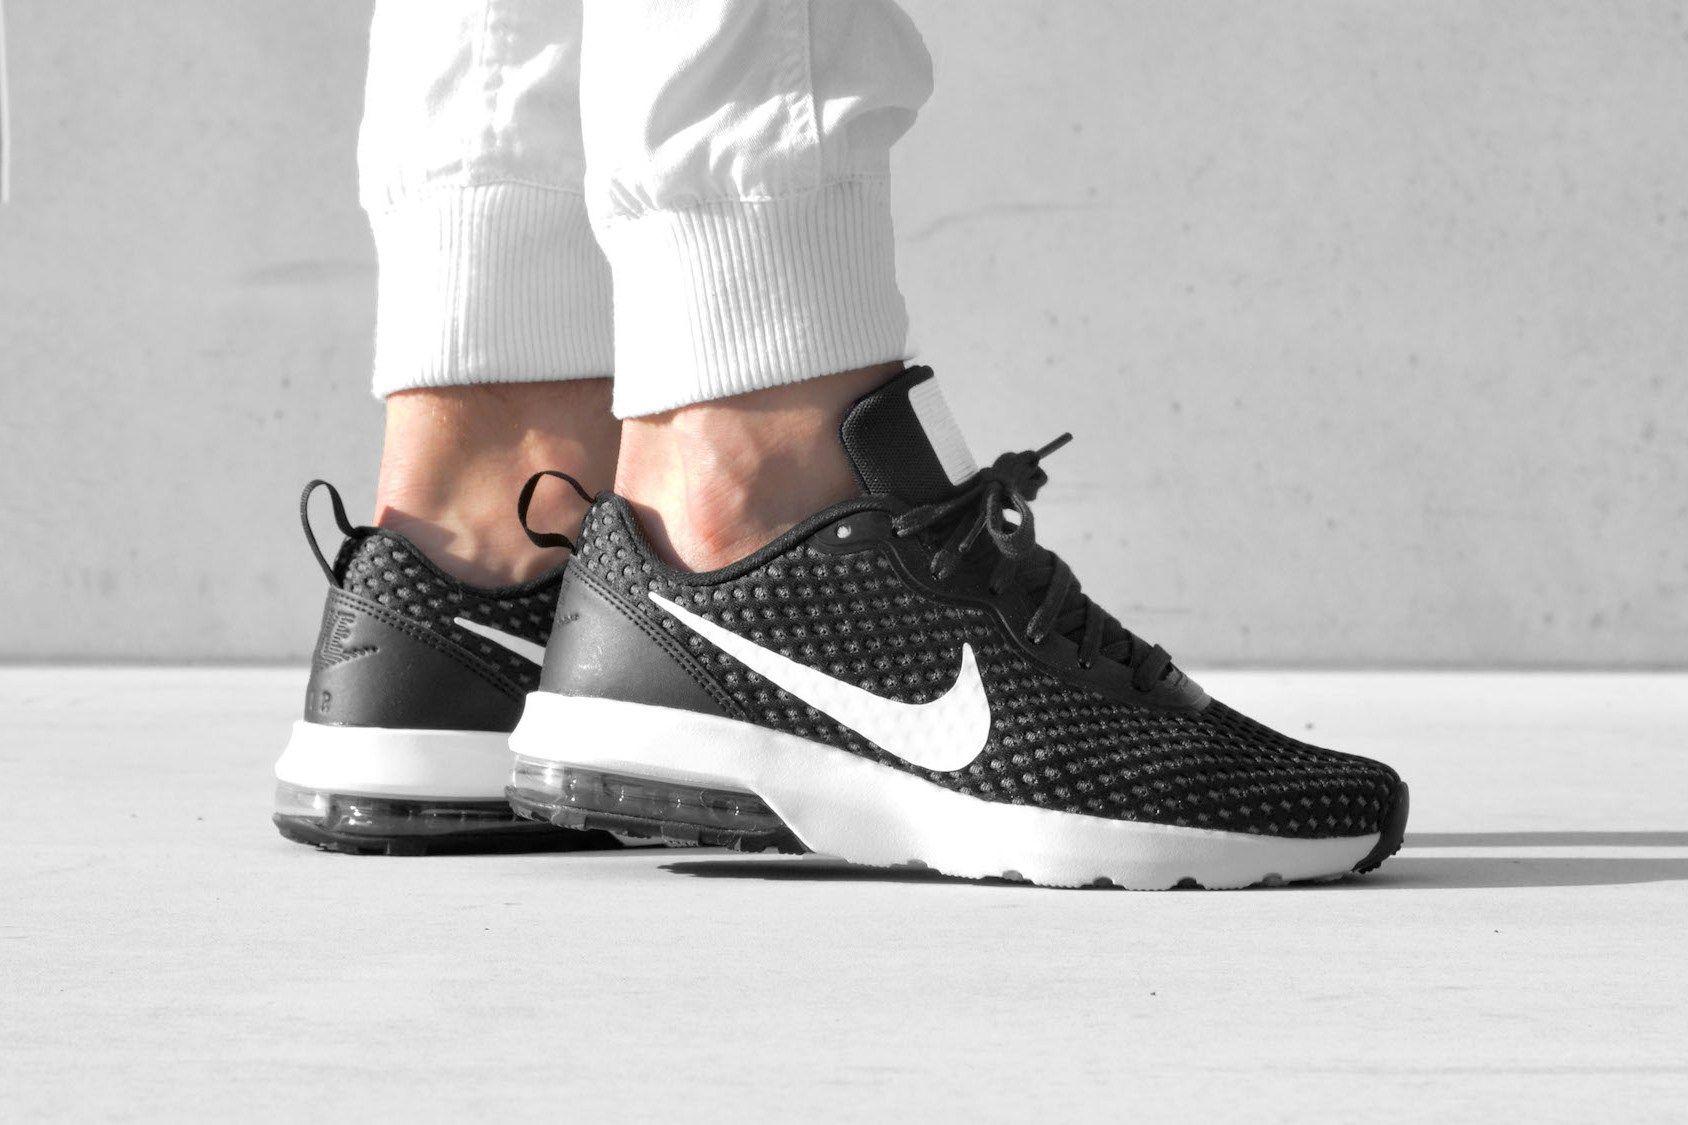 Nike Air Max Turbulence LS Men's Running Shoes Wolf GreyPure PlatinumWhite sku:27177012